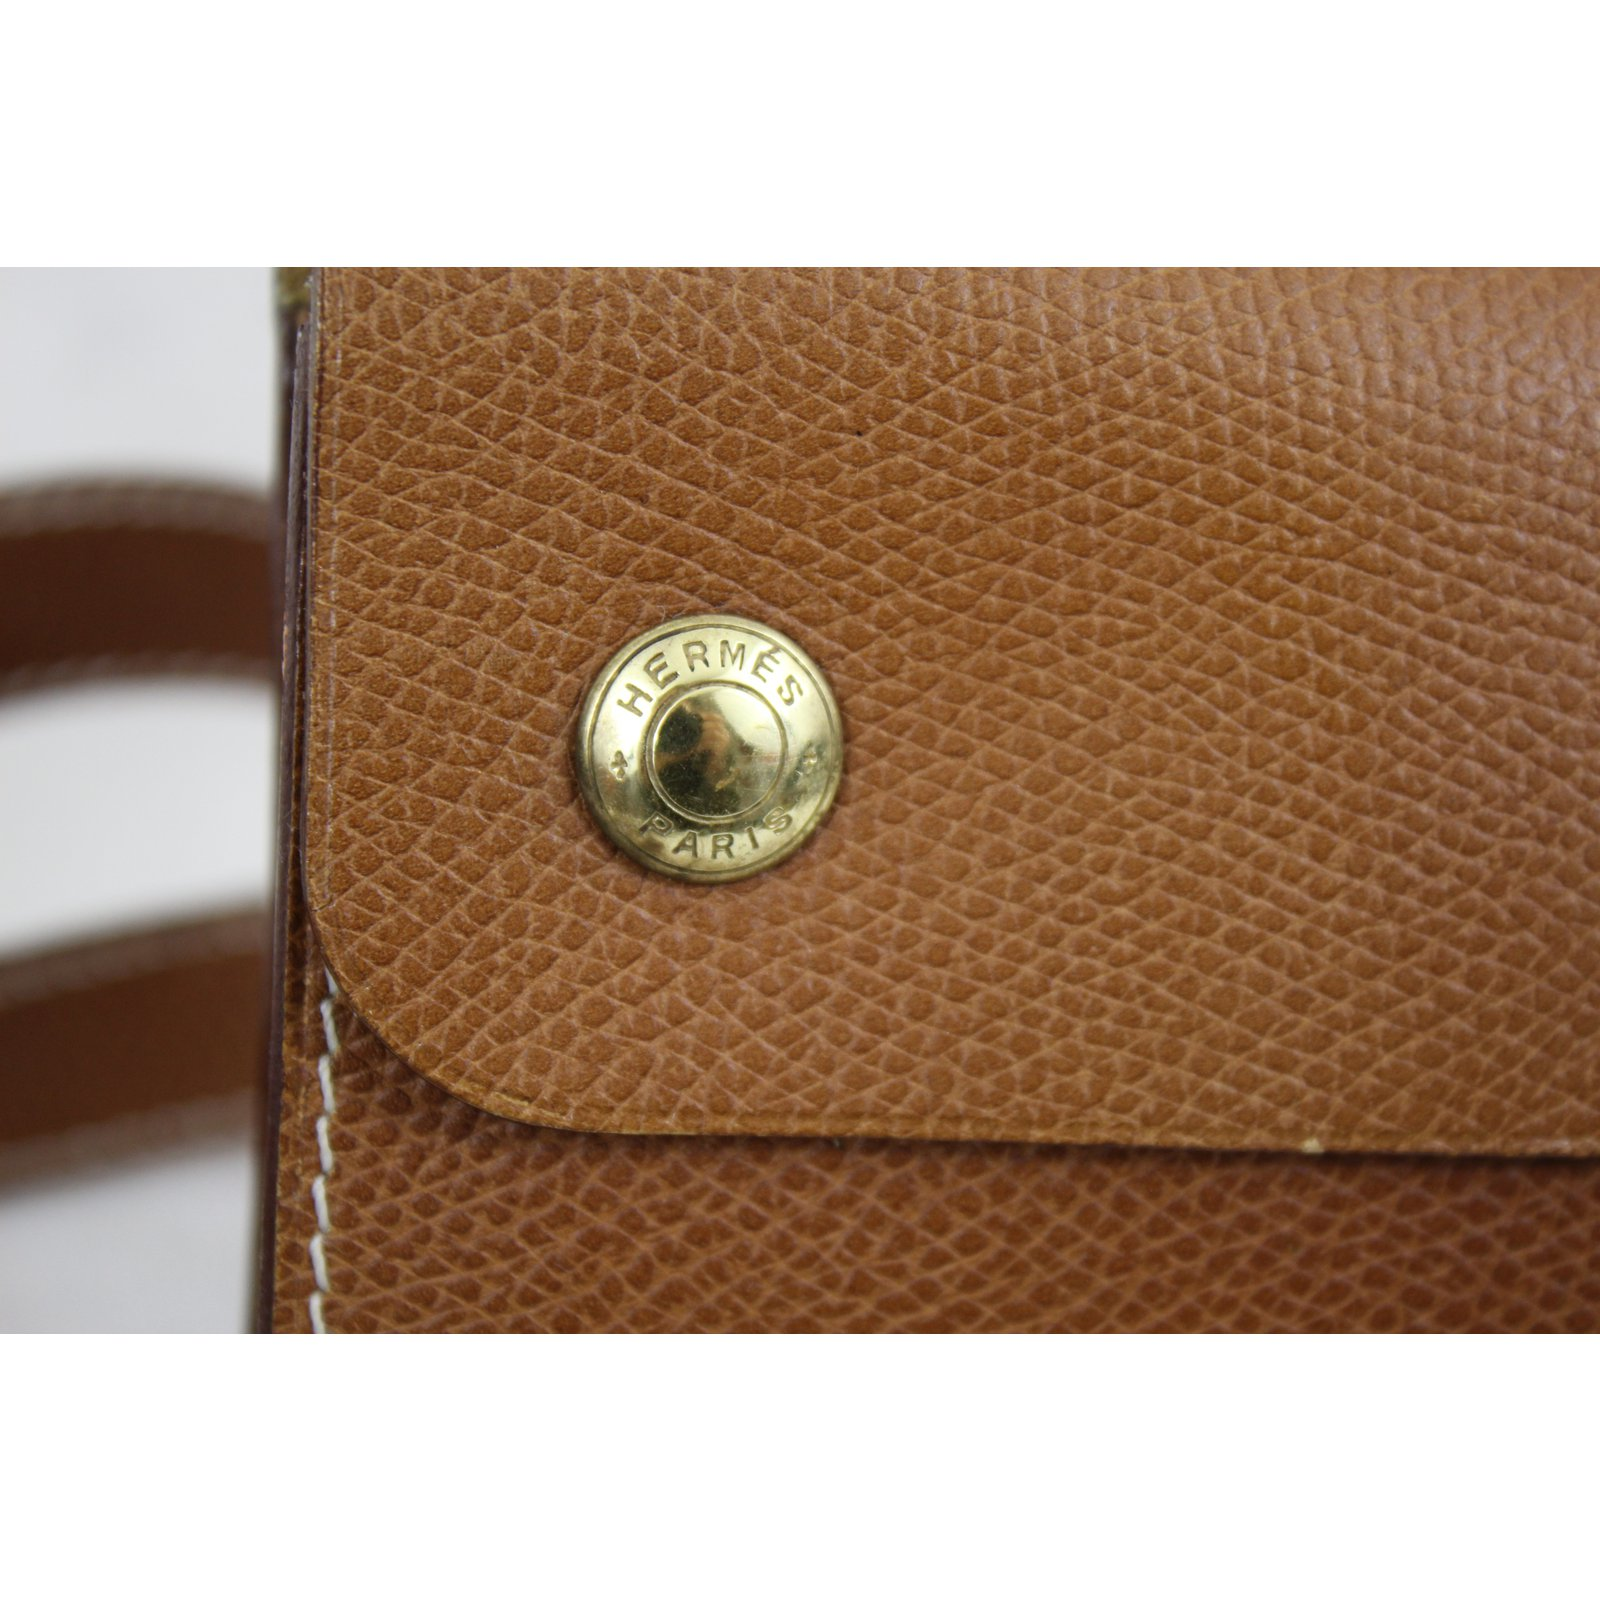 cbf3ae3bb43 Petite maroquinerie Hermès Sac Ceinture Cuir Marron ref.41600 - Joli Closet